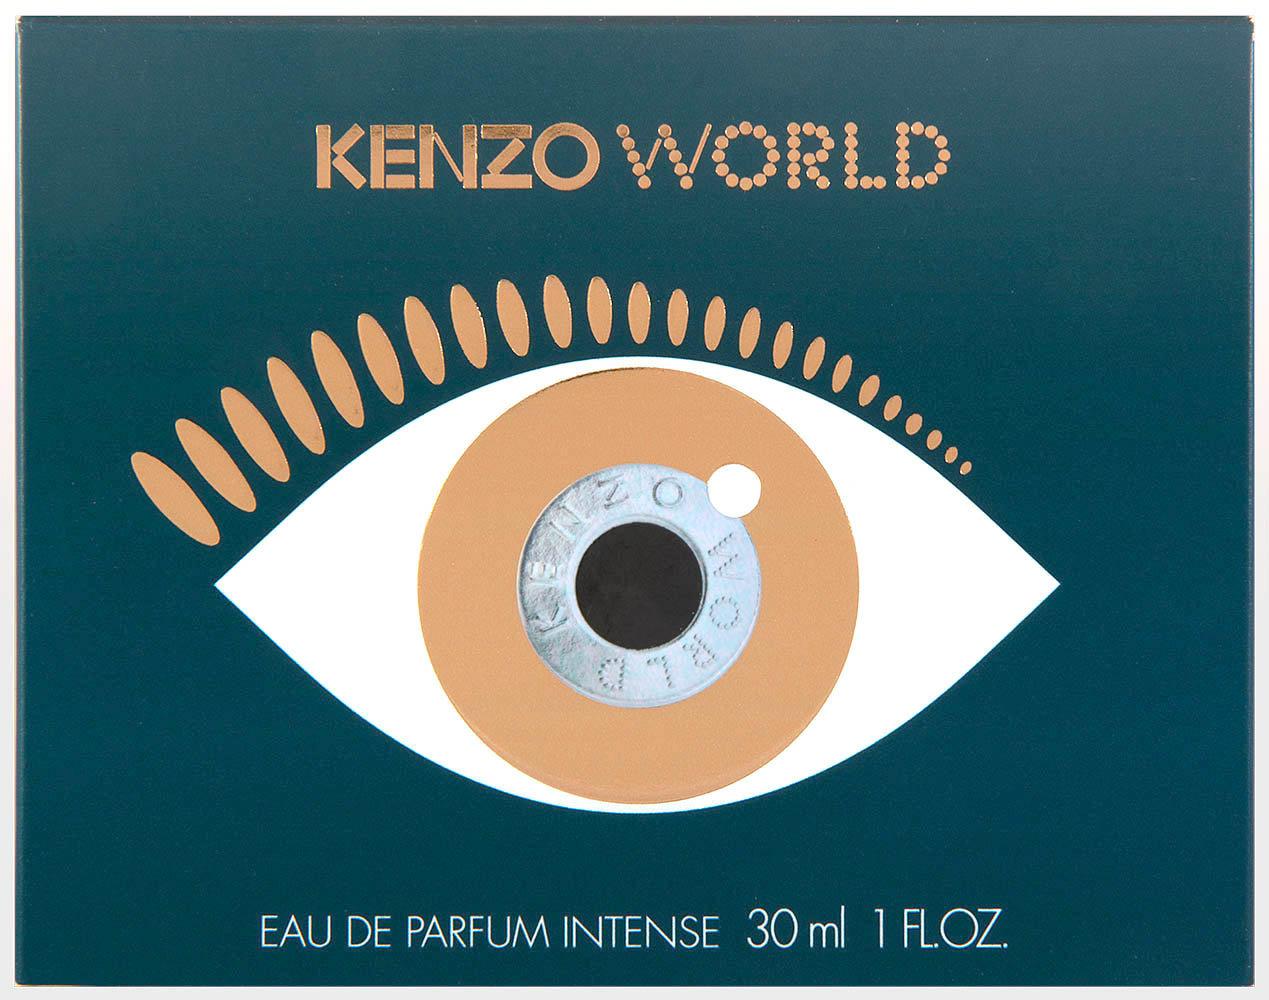 Kenzo World Intense Eau de Parfum